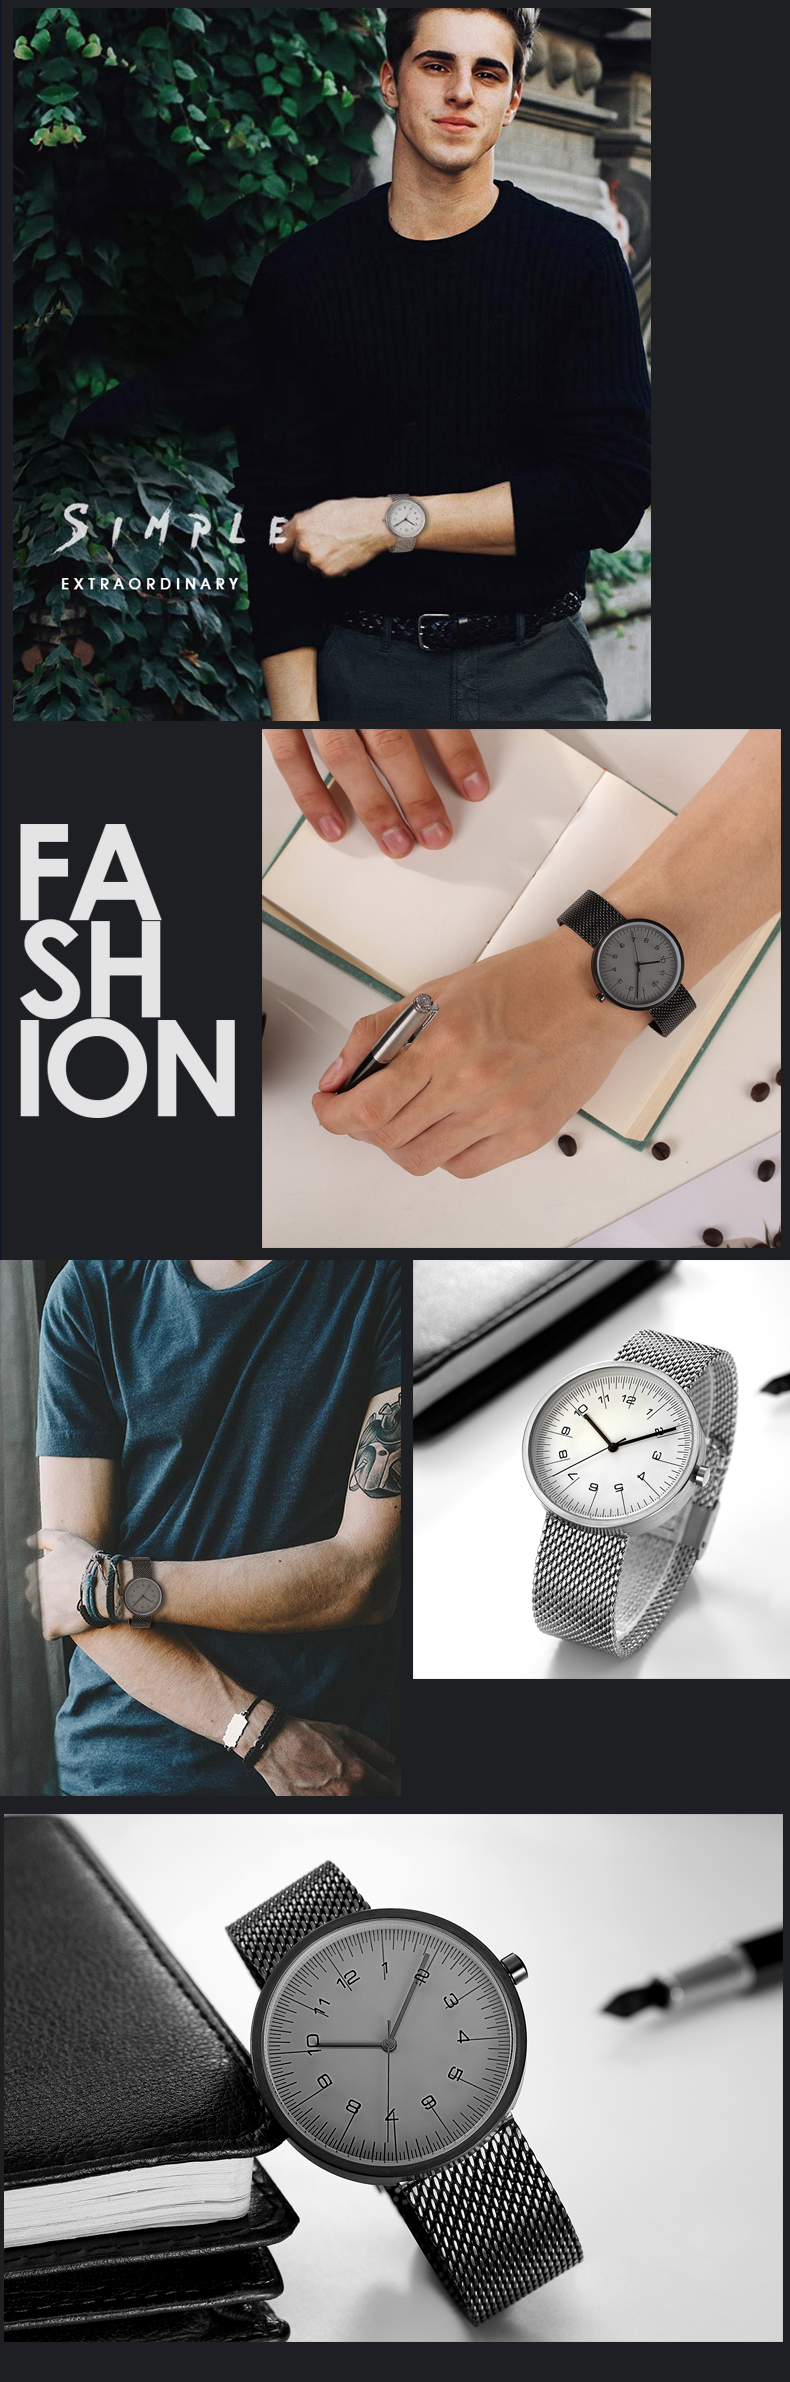 2017 Fashion Trends Watch Men Luxury Brand Quartz Watches Minimalist Jus Mangga By Sabrina Casava Ui Style Fine Mesh Strap Wristwatch Japan Movement Us125